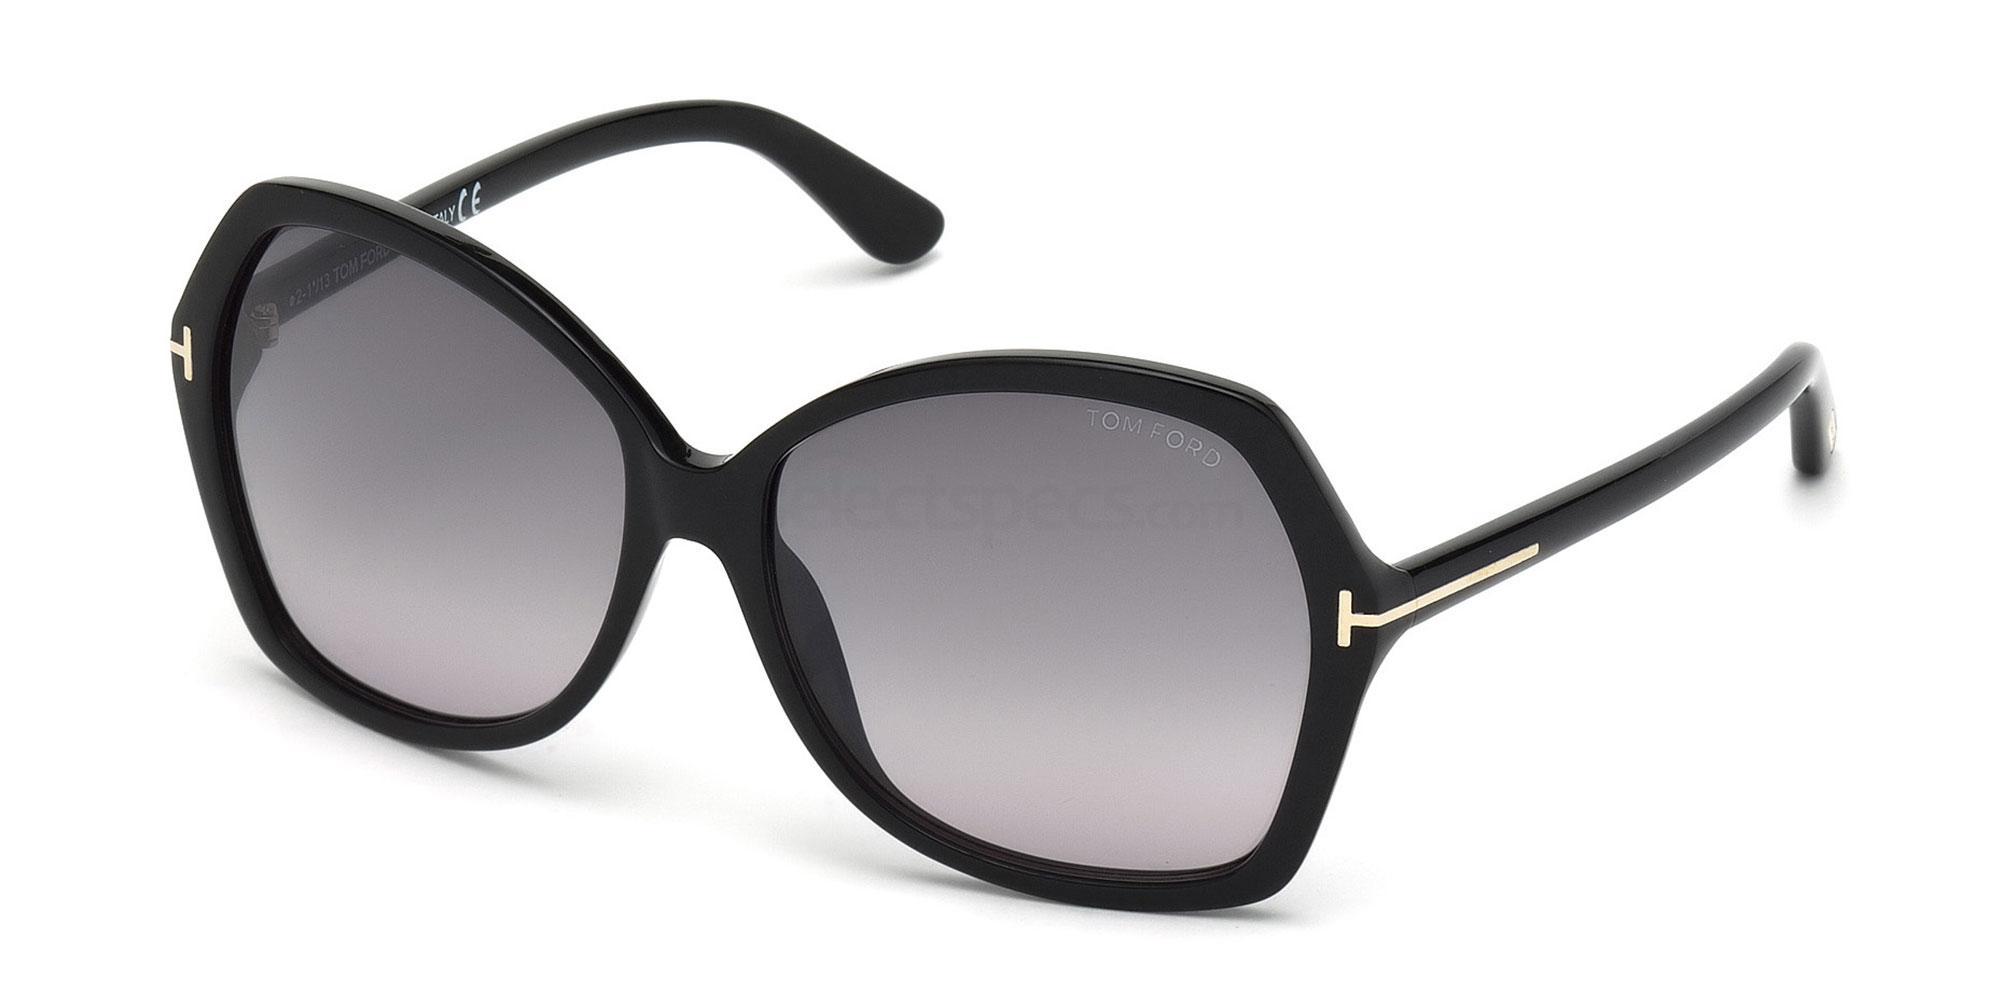 01B FT0328 CAROLA Sunglasses, Tom Ford